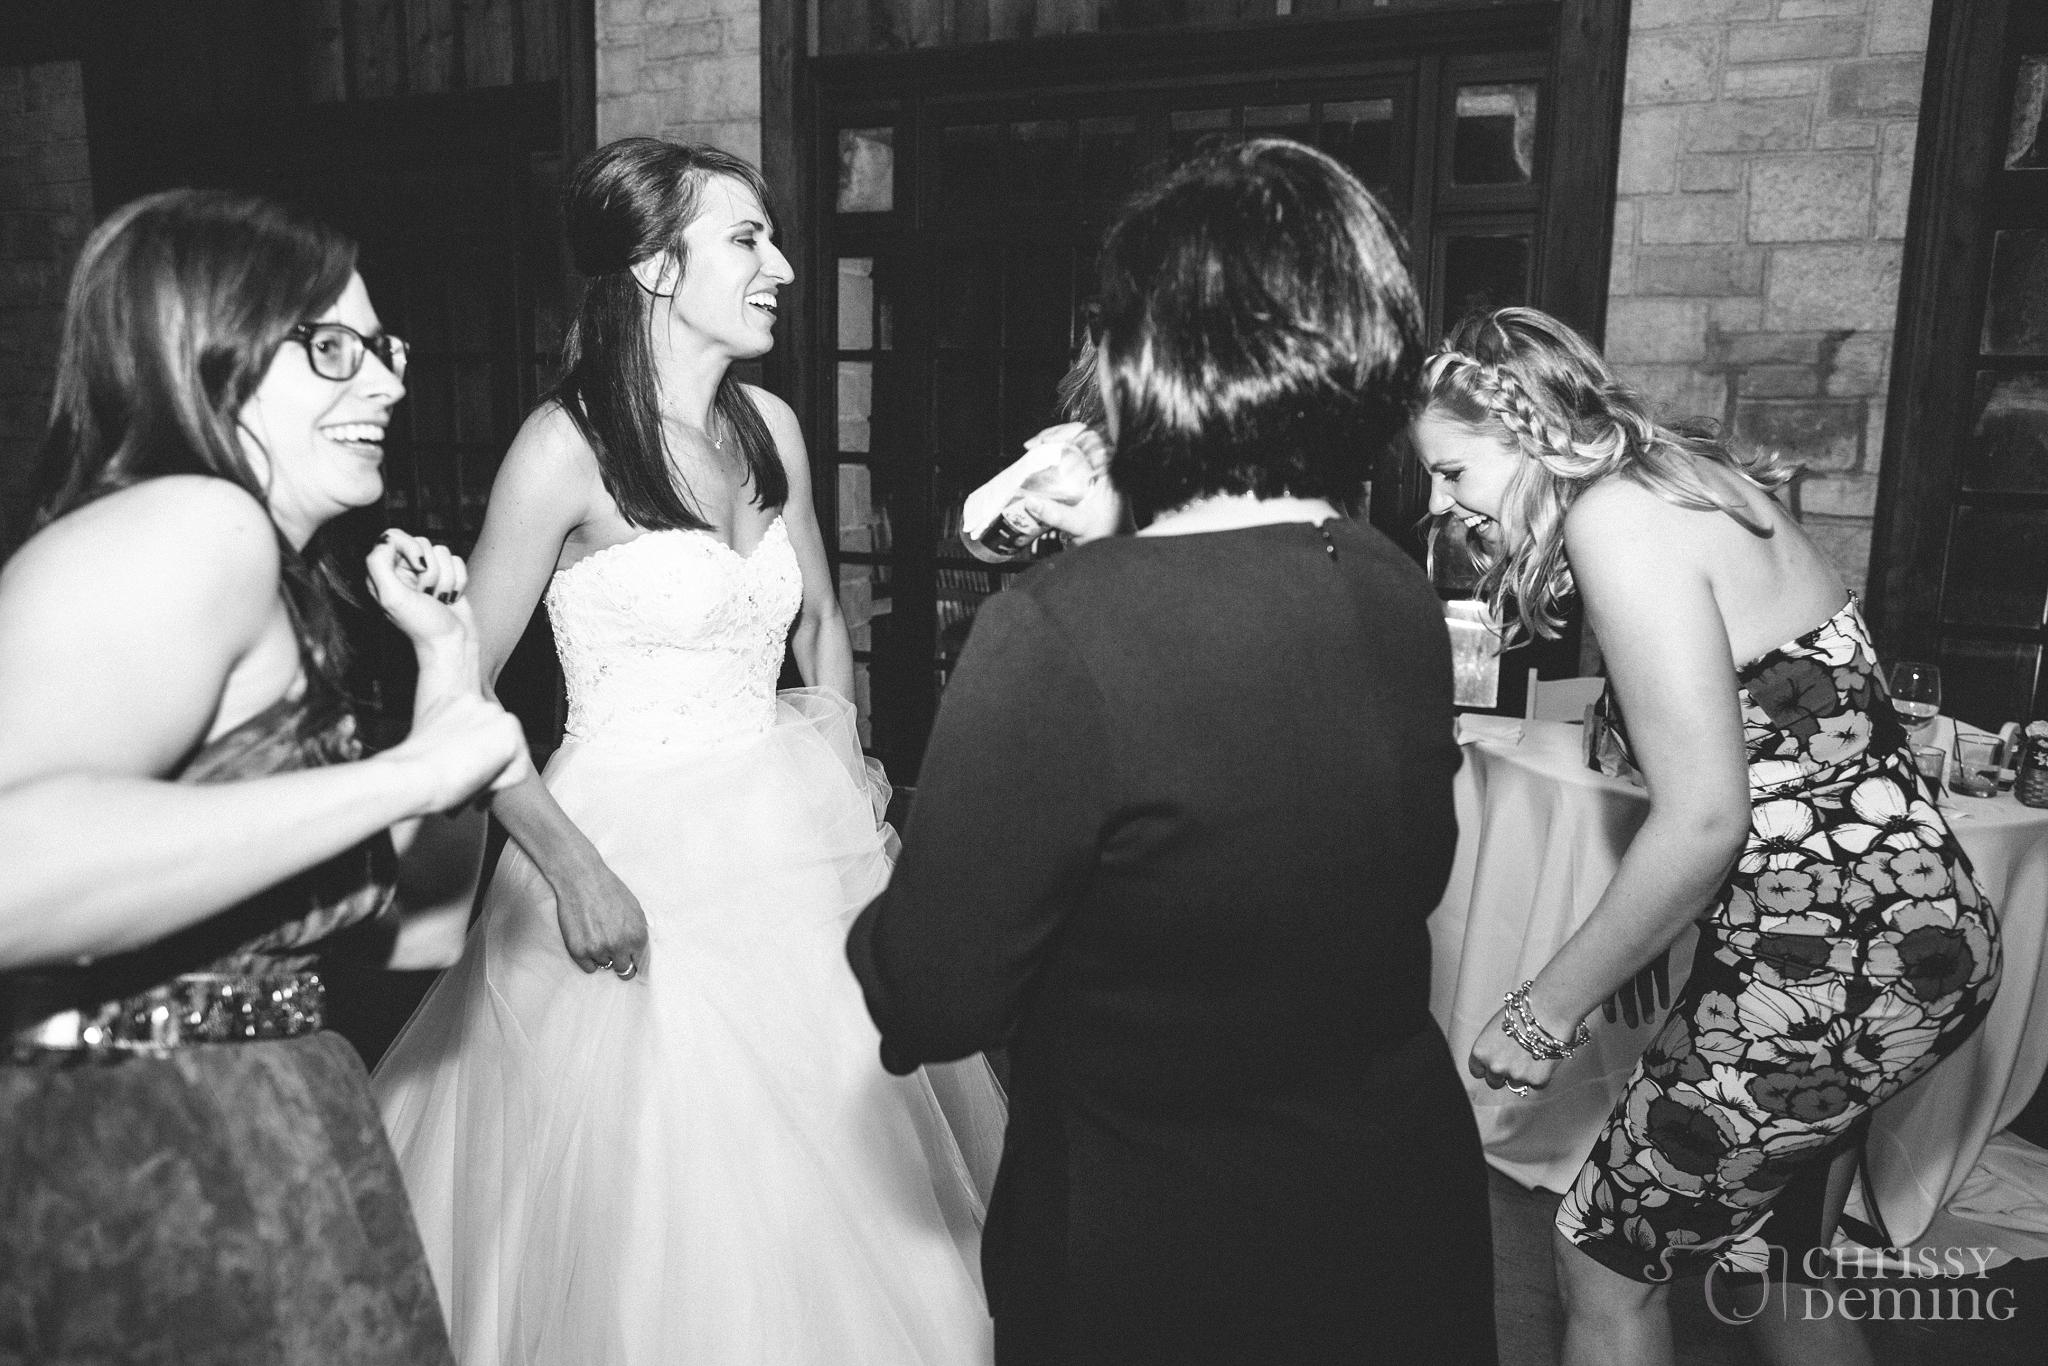 promontory_point_chicago_wedding_photography_0041.jpg